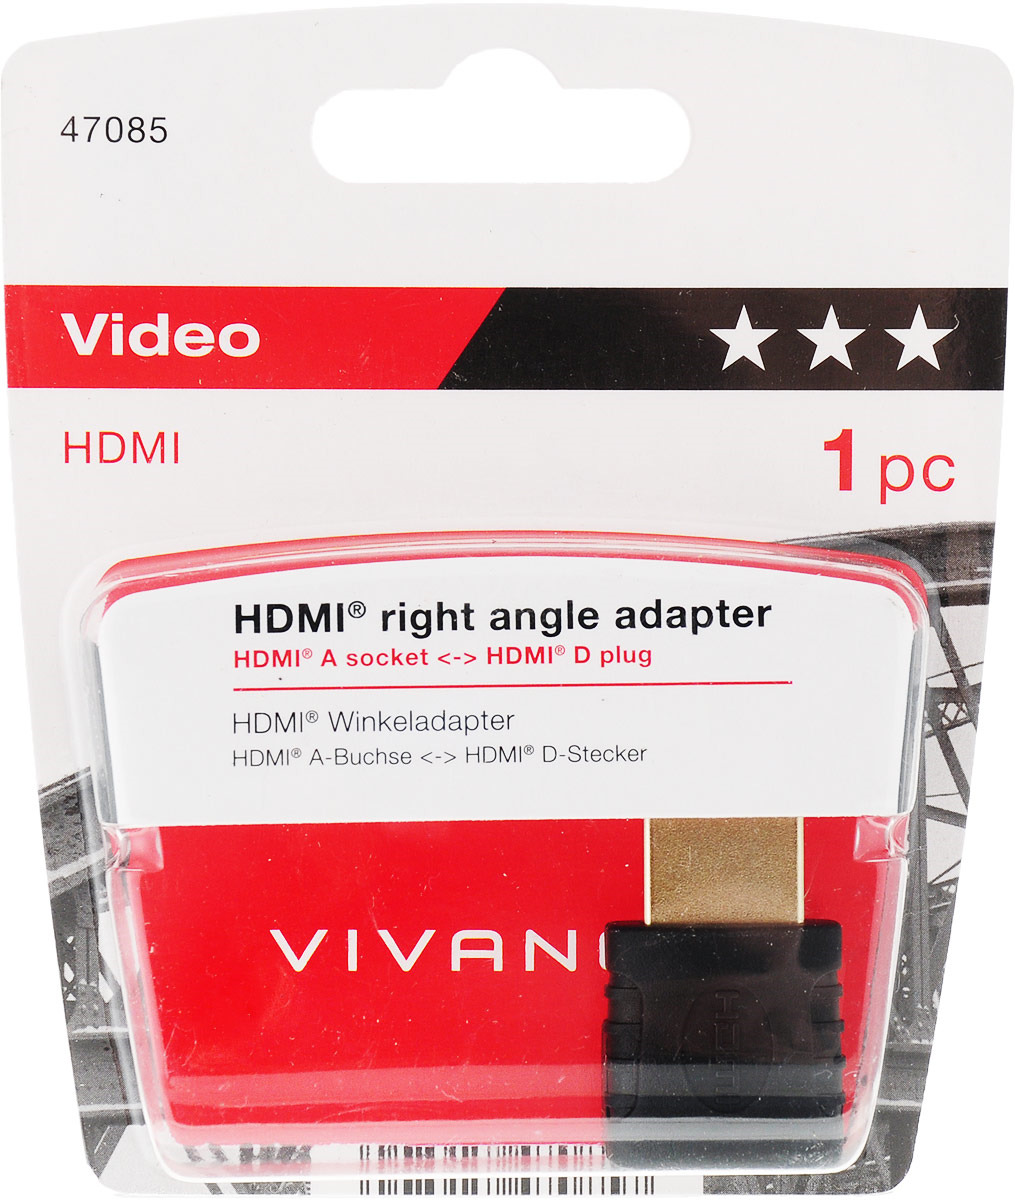 Кабель HDMI Vivanco Ordinary 47/14 03, черный кабель hdmi vivanco ordinary 47 10 10g 1 м черный